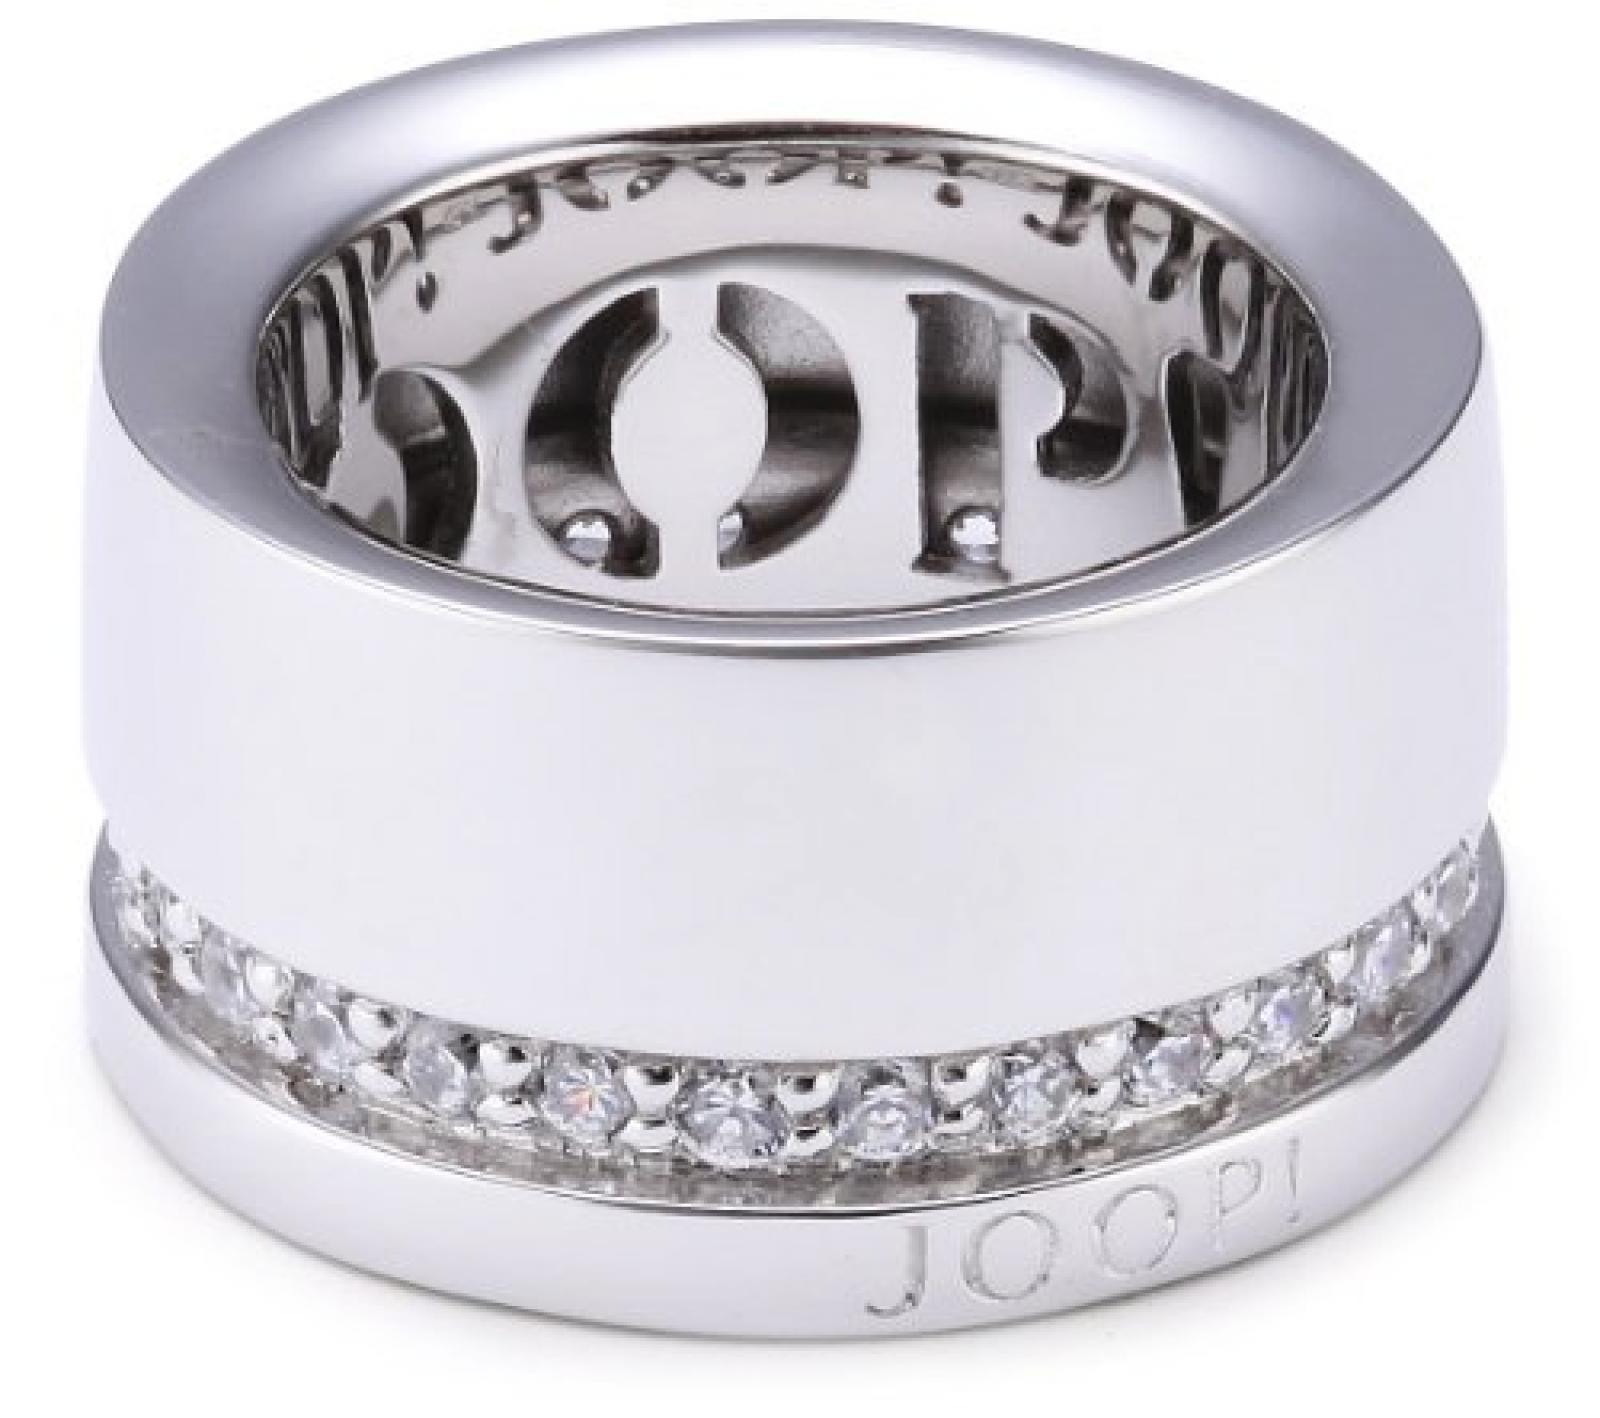 Joop! Ring 53 JPRG90513A510